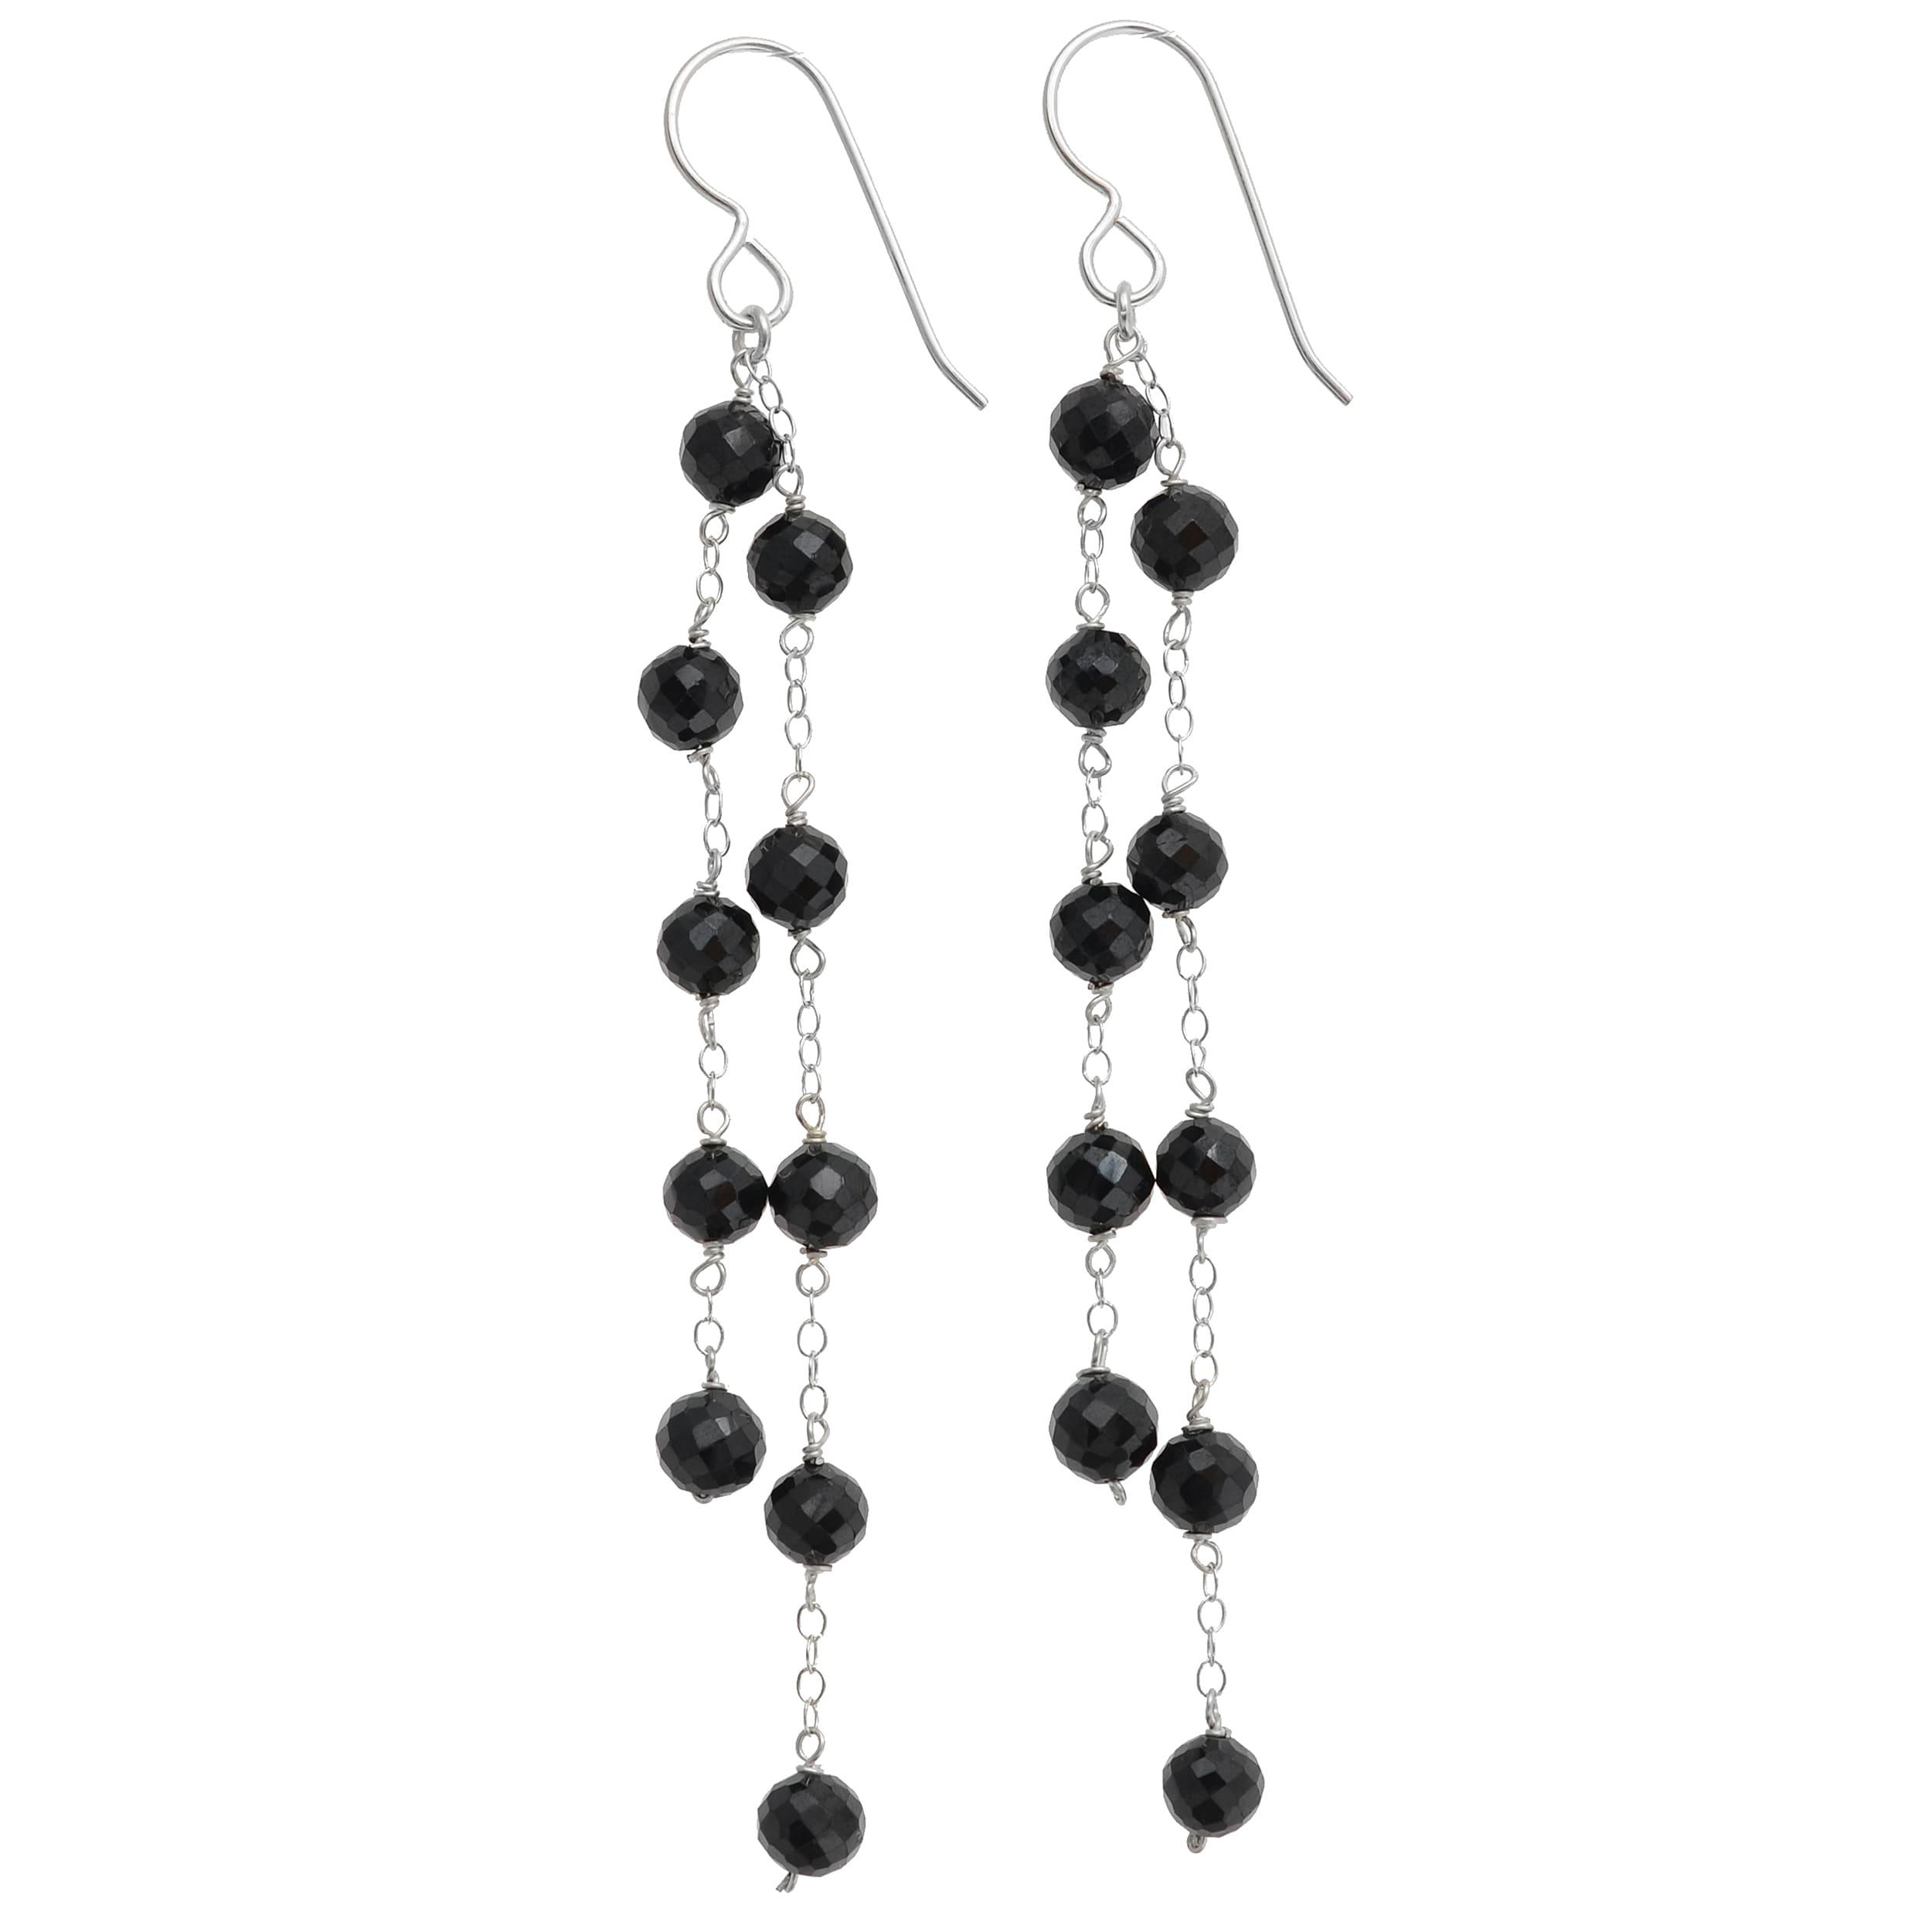 e9bb9959d7 Shop Handmade Ashanti Sterling Silver Natural Black Spinel Earrings (Sri  Lanka) - Free Shipping Today - Overstock.com - 8161744